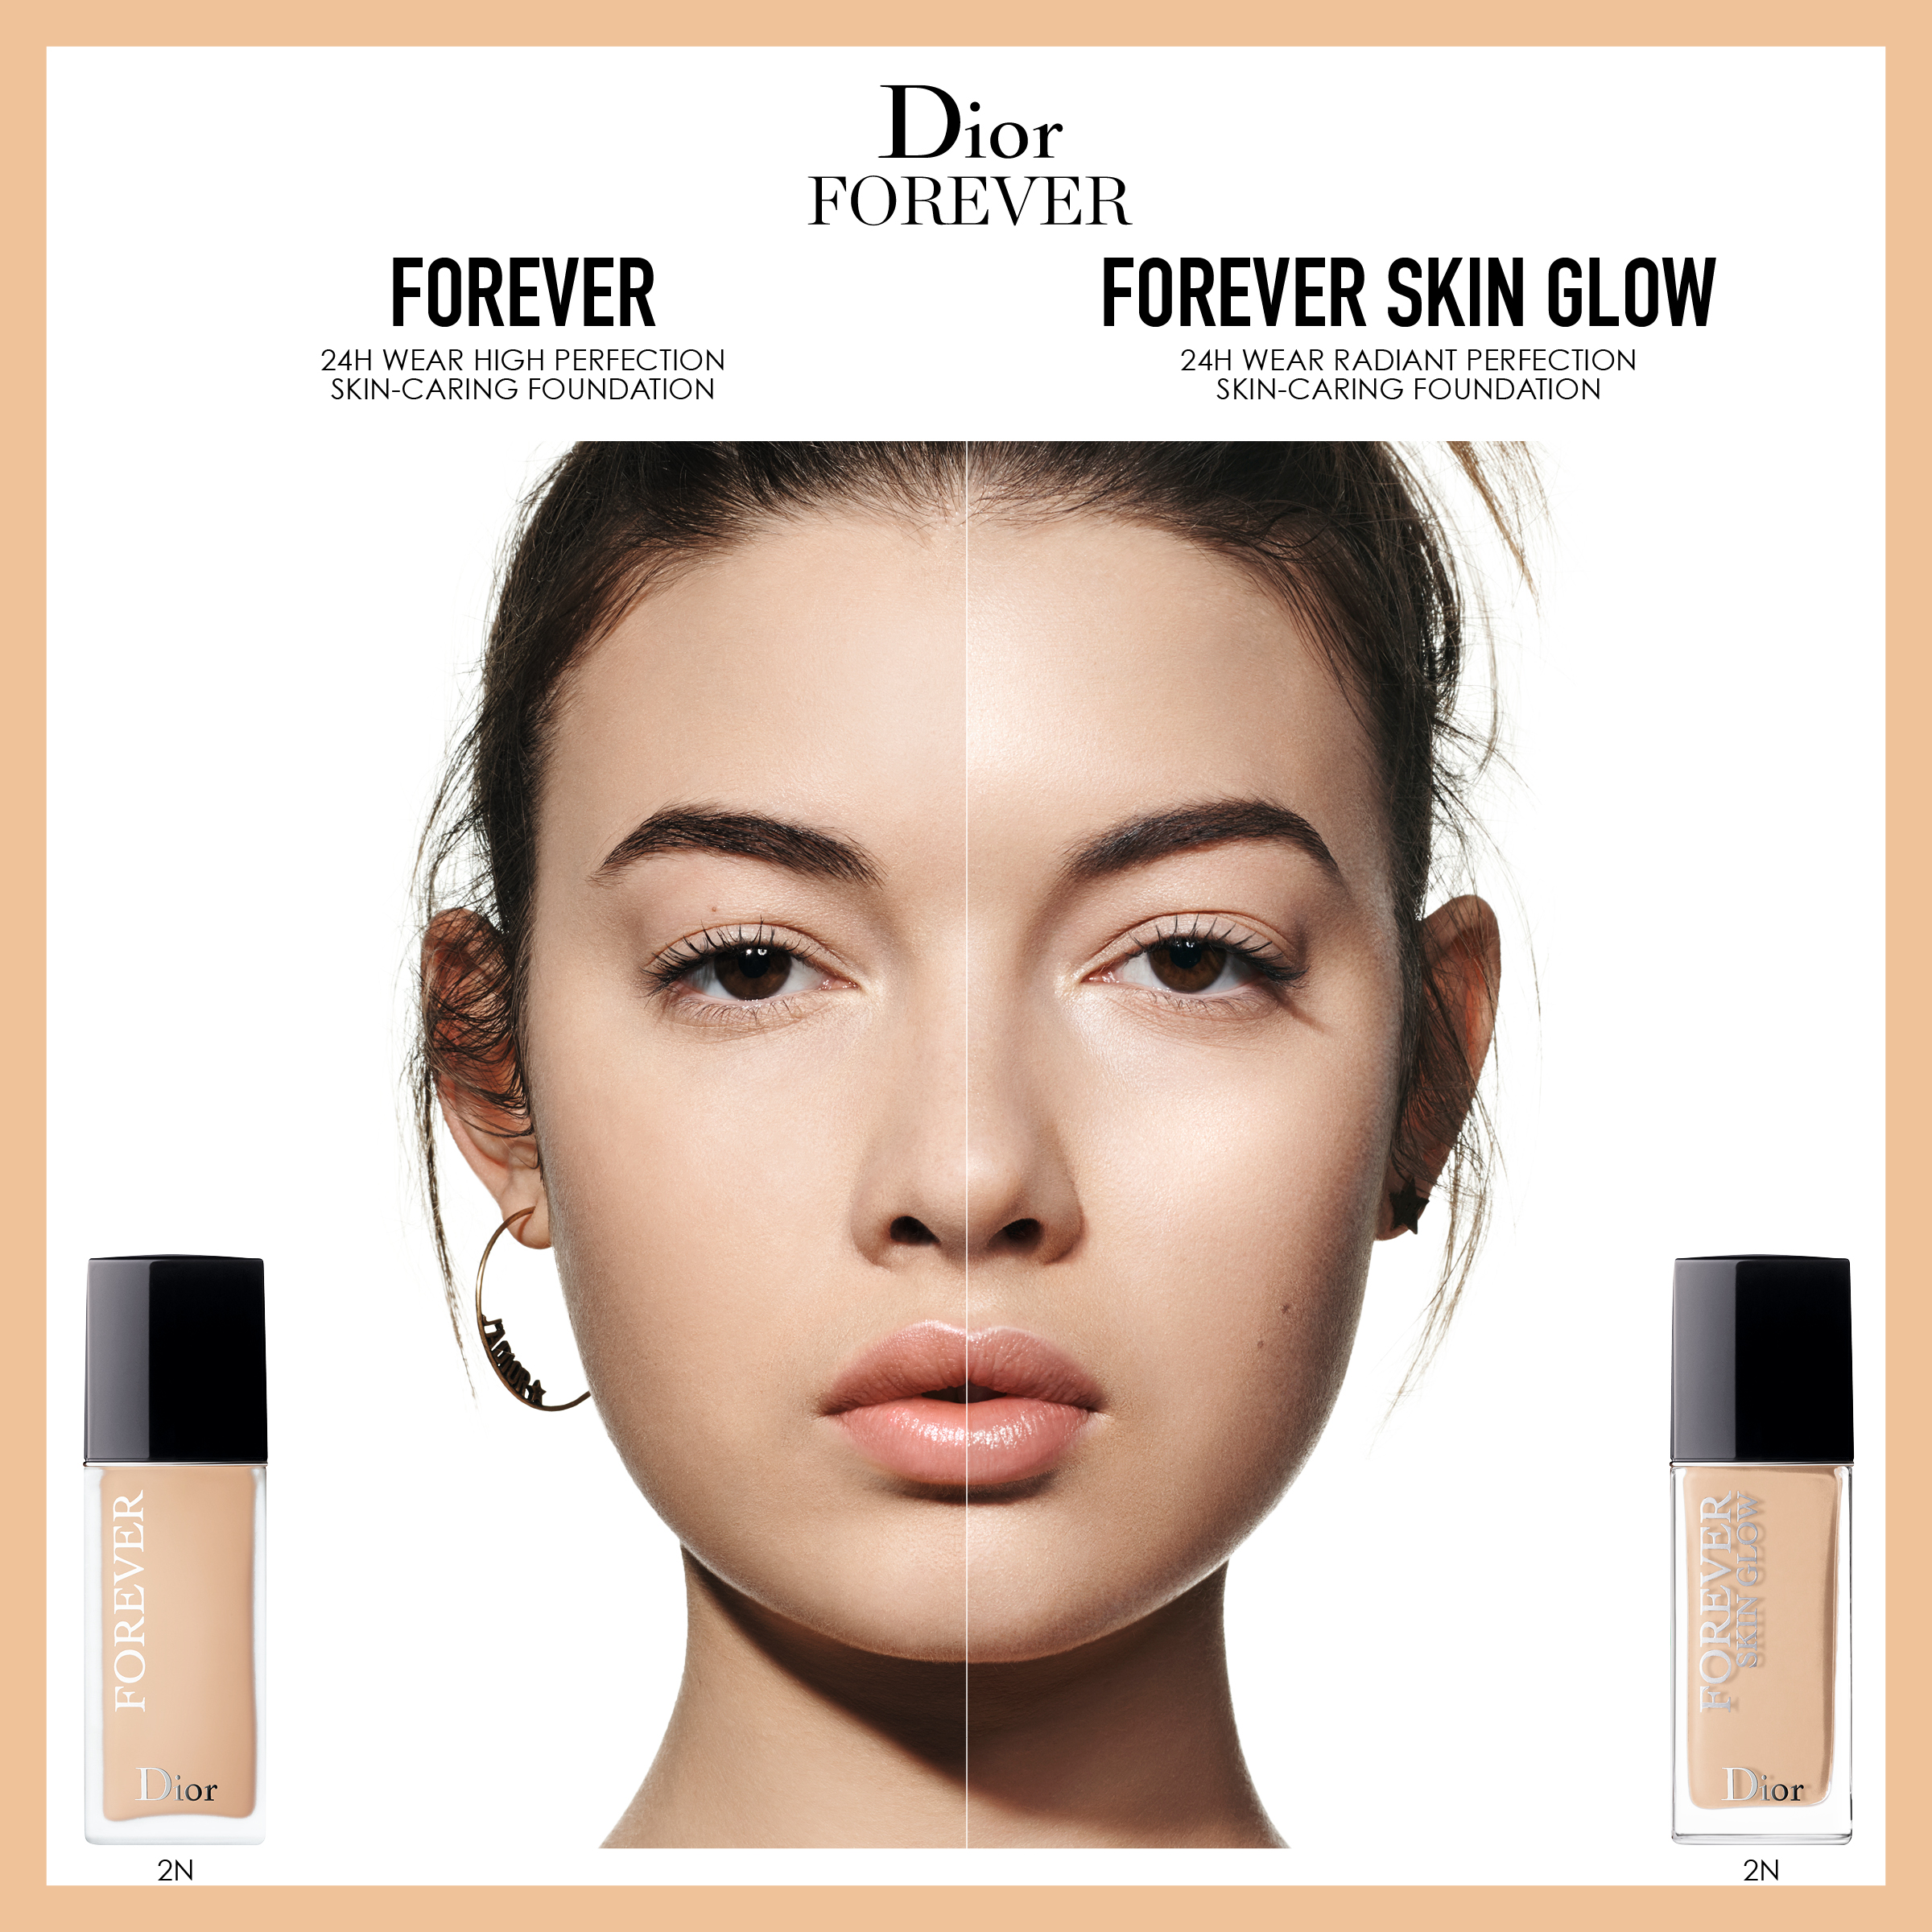 DIOR Forever Fluid Foundation, 2 Warm